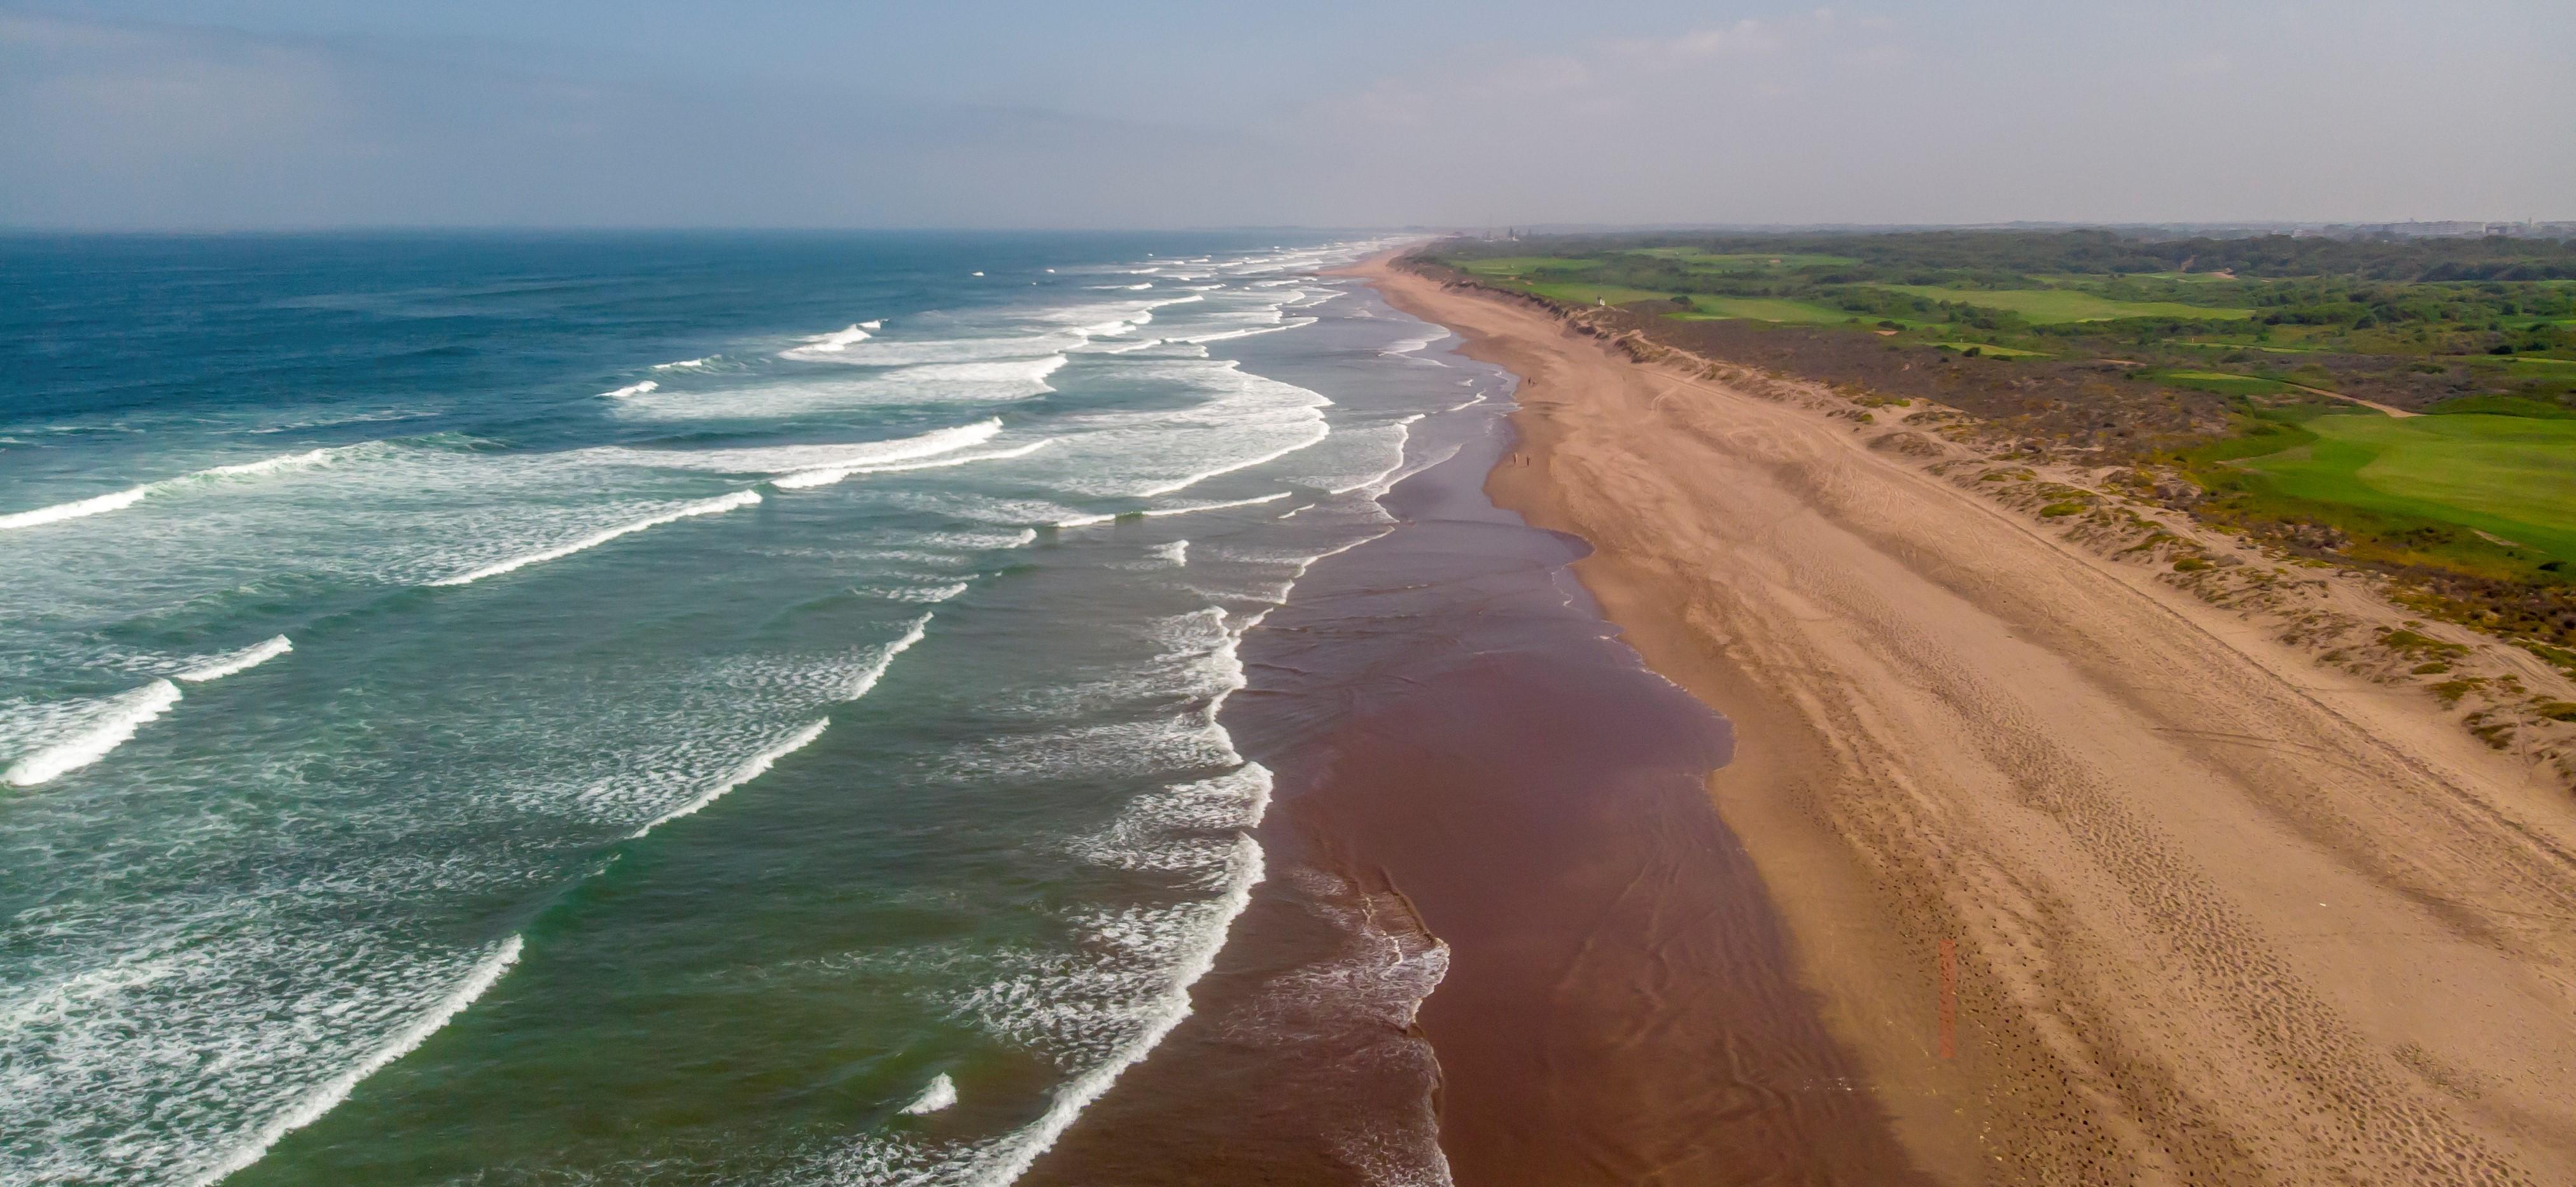 luxury-family-beach-resort-morocco